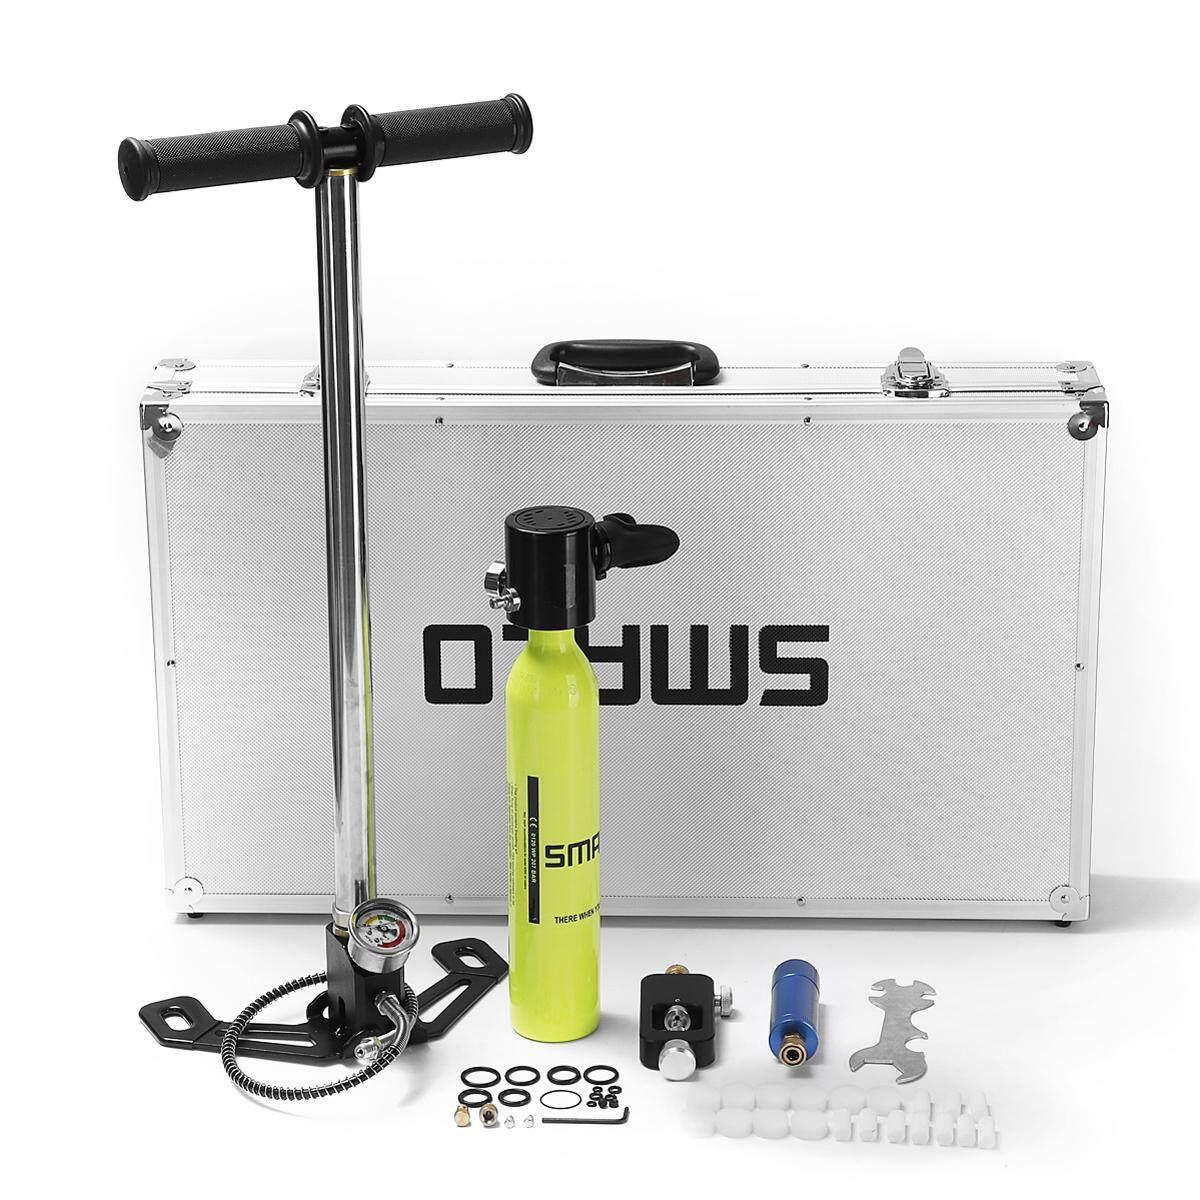 0.5L Portable Mini Tank Oxygen Bottle Diving Swimming Breath # 2